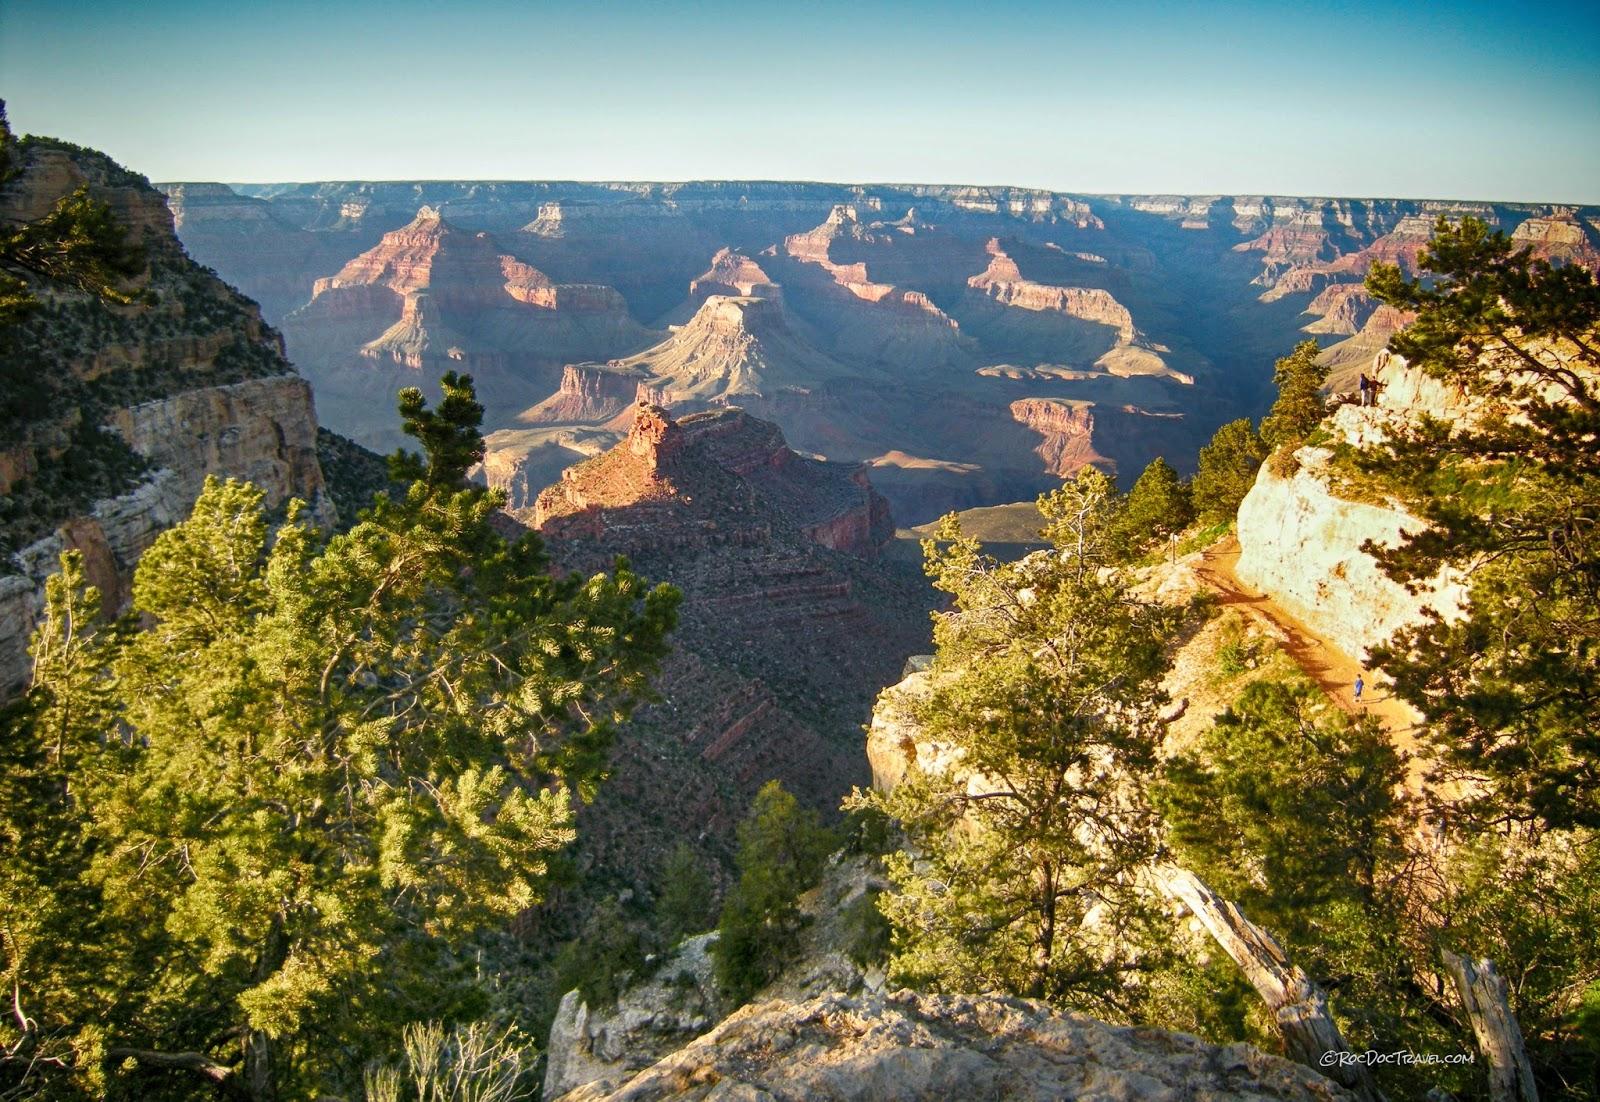 Grand Canyon National Park Arizona Bright Angel Trail south rim geology travel trip copyright rocdoctravel.com